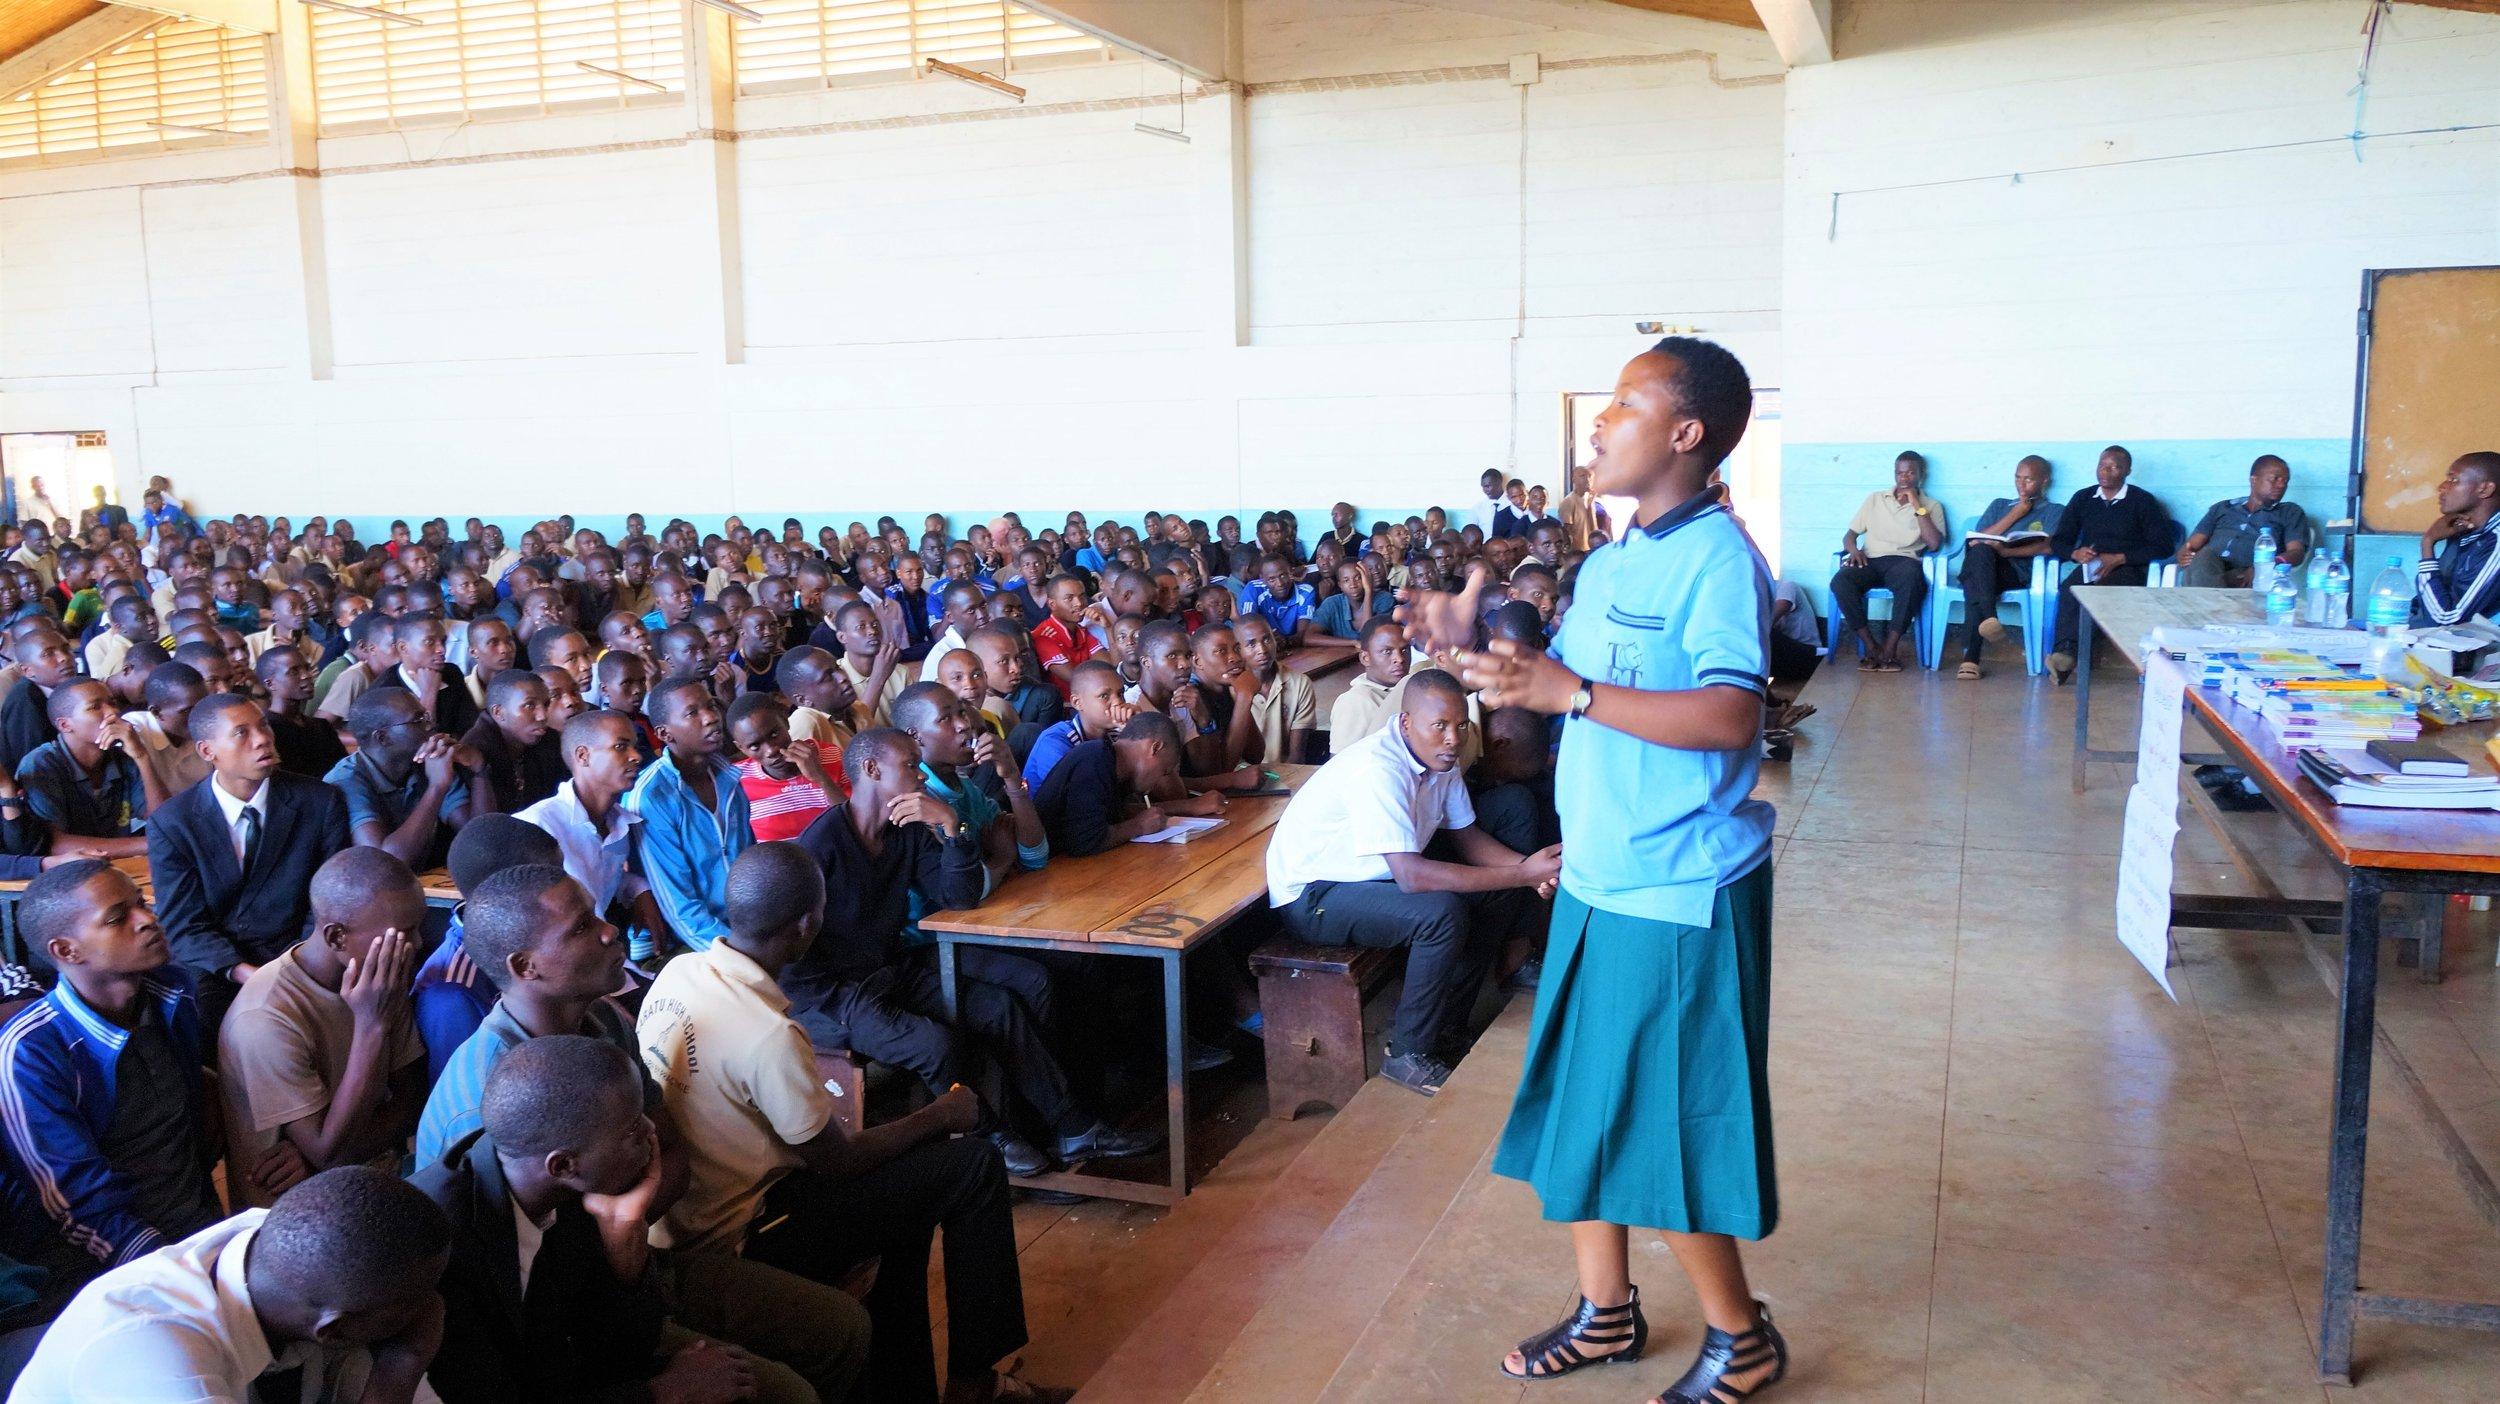 Melanie speaking about menstruation to 715 young men at Karatu High School. (Courtesy of Nano Chatfield / The Girls Foundation of Tanzania)